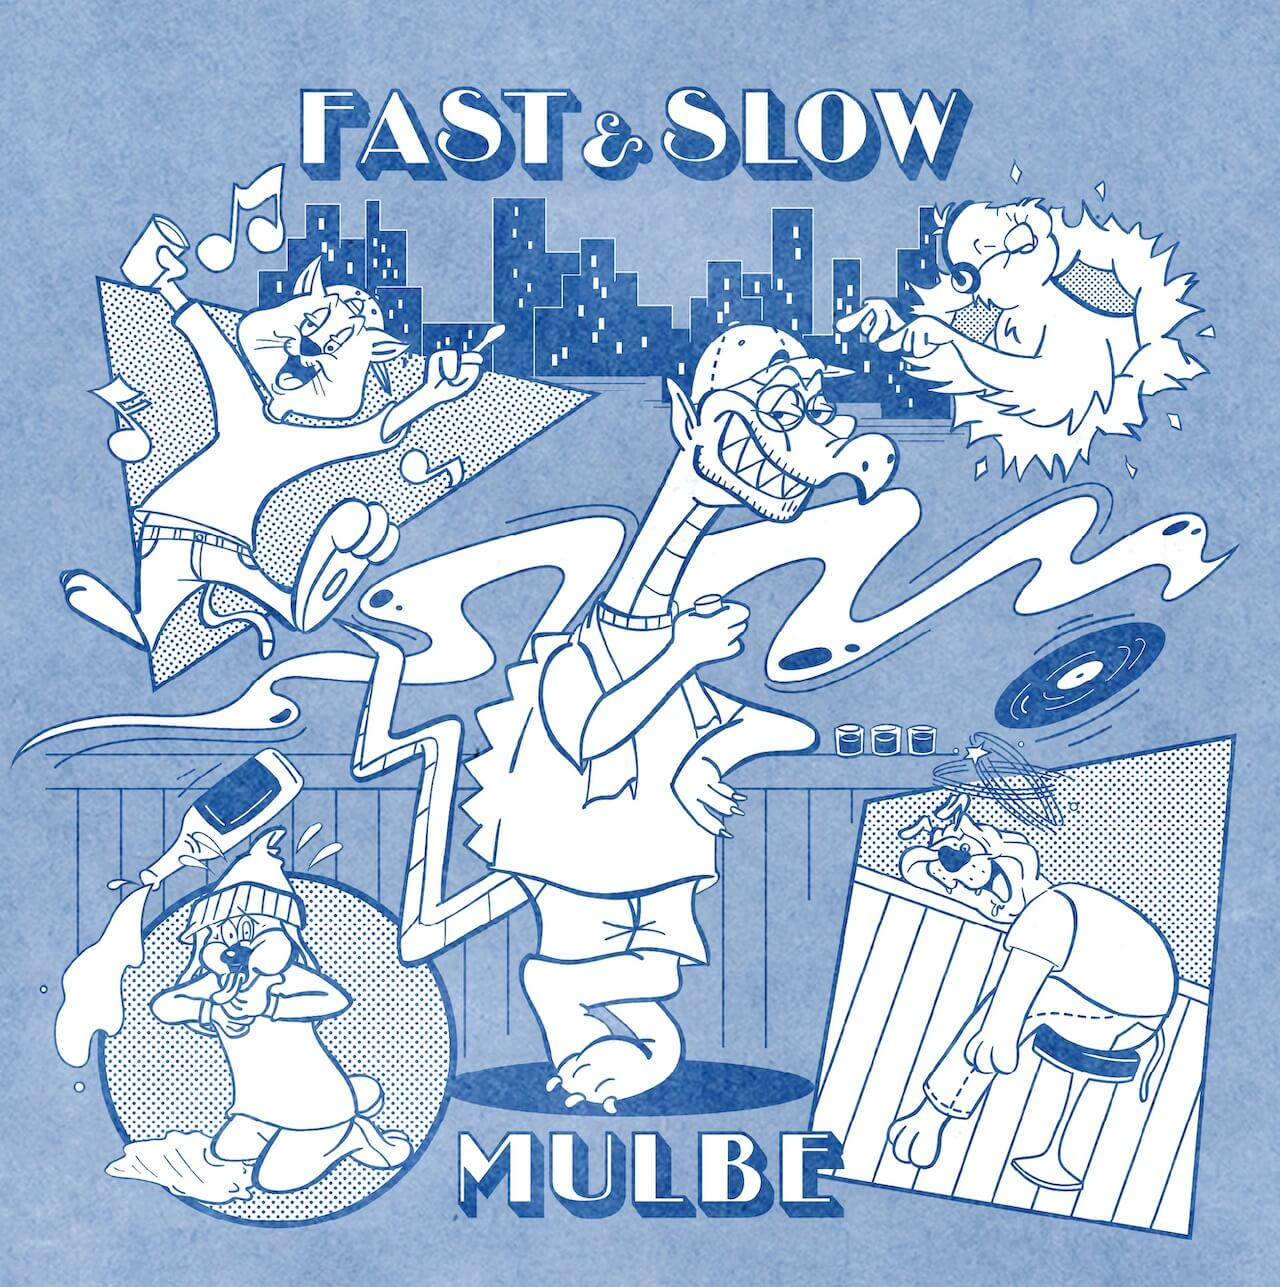 MULBEの1stフルアルバム『FAST&SLOW』のVINYL LISTENING SHOWが本日開催 music201021-mulbe-1